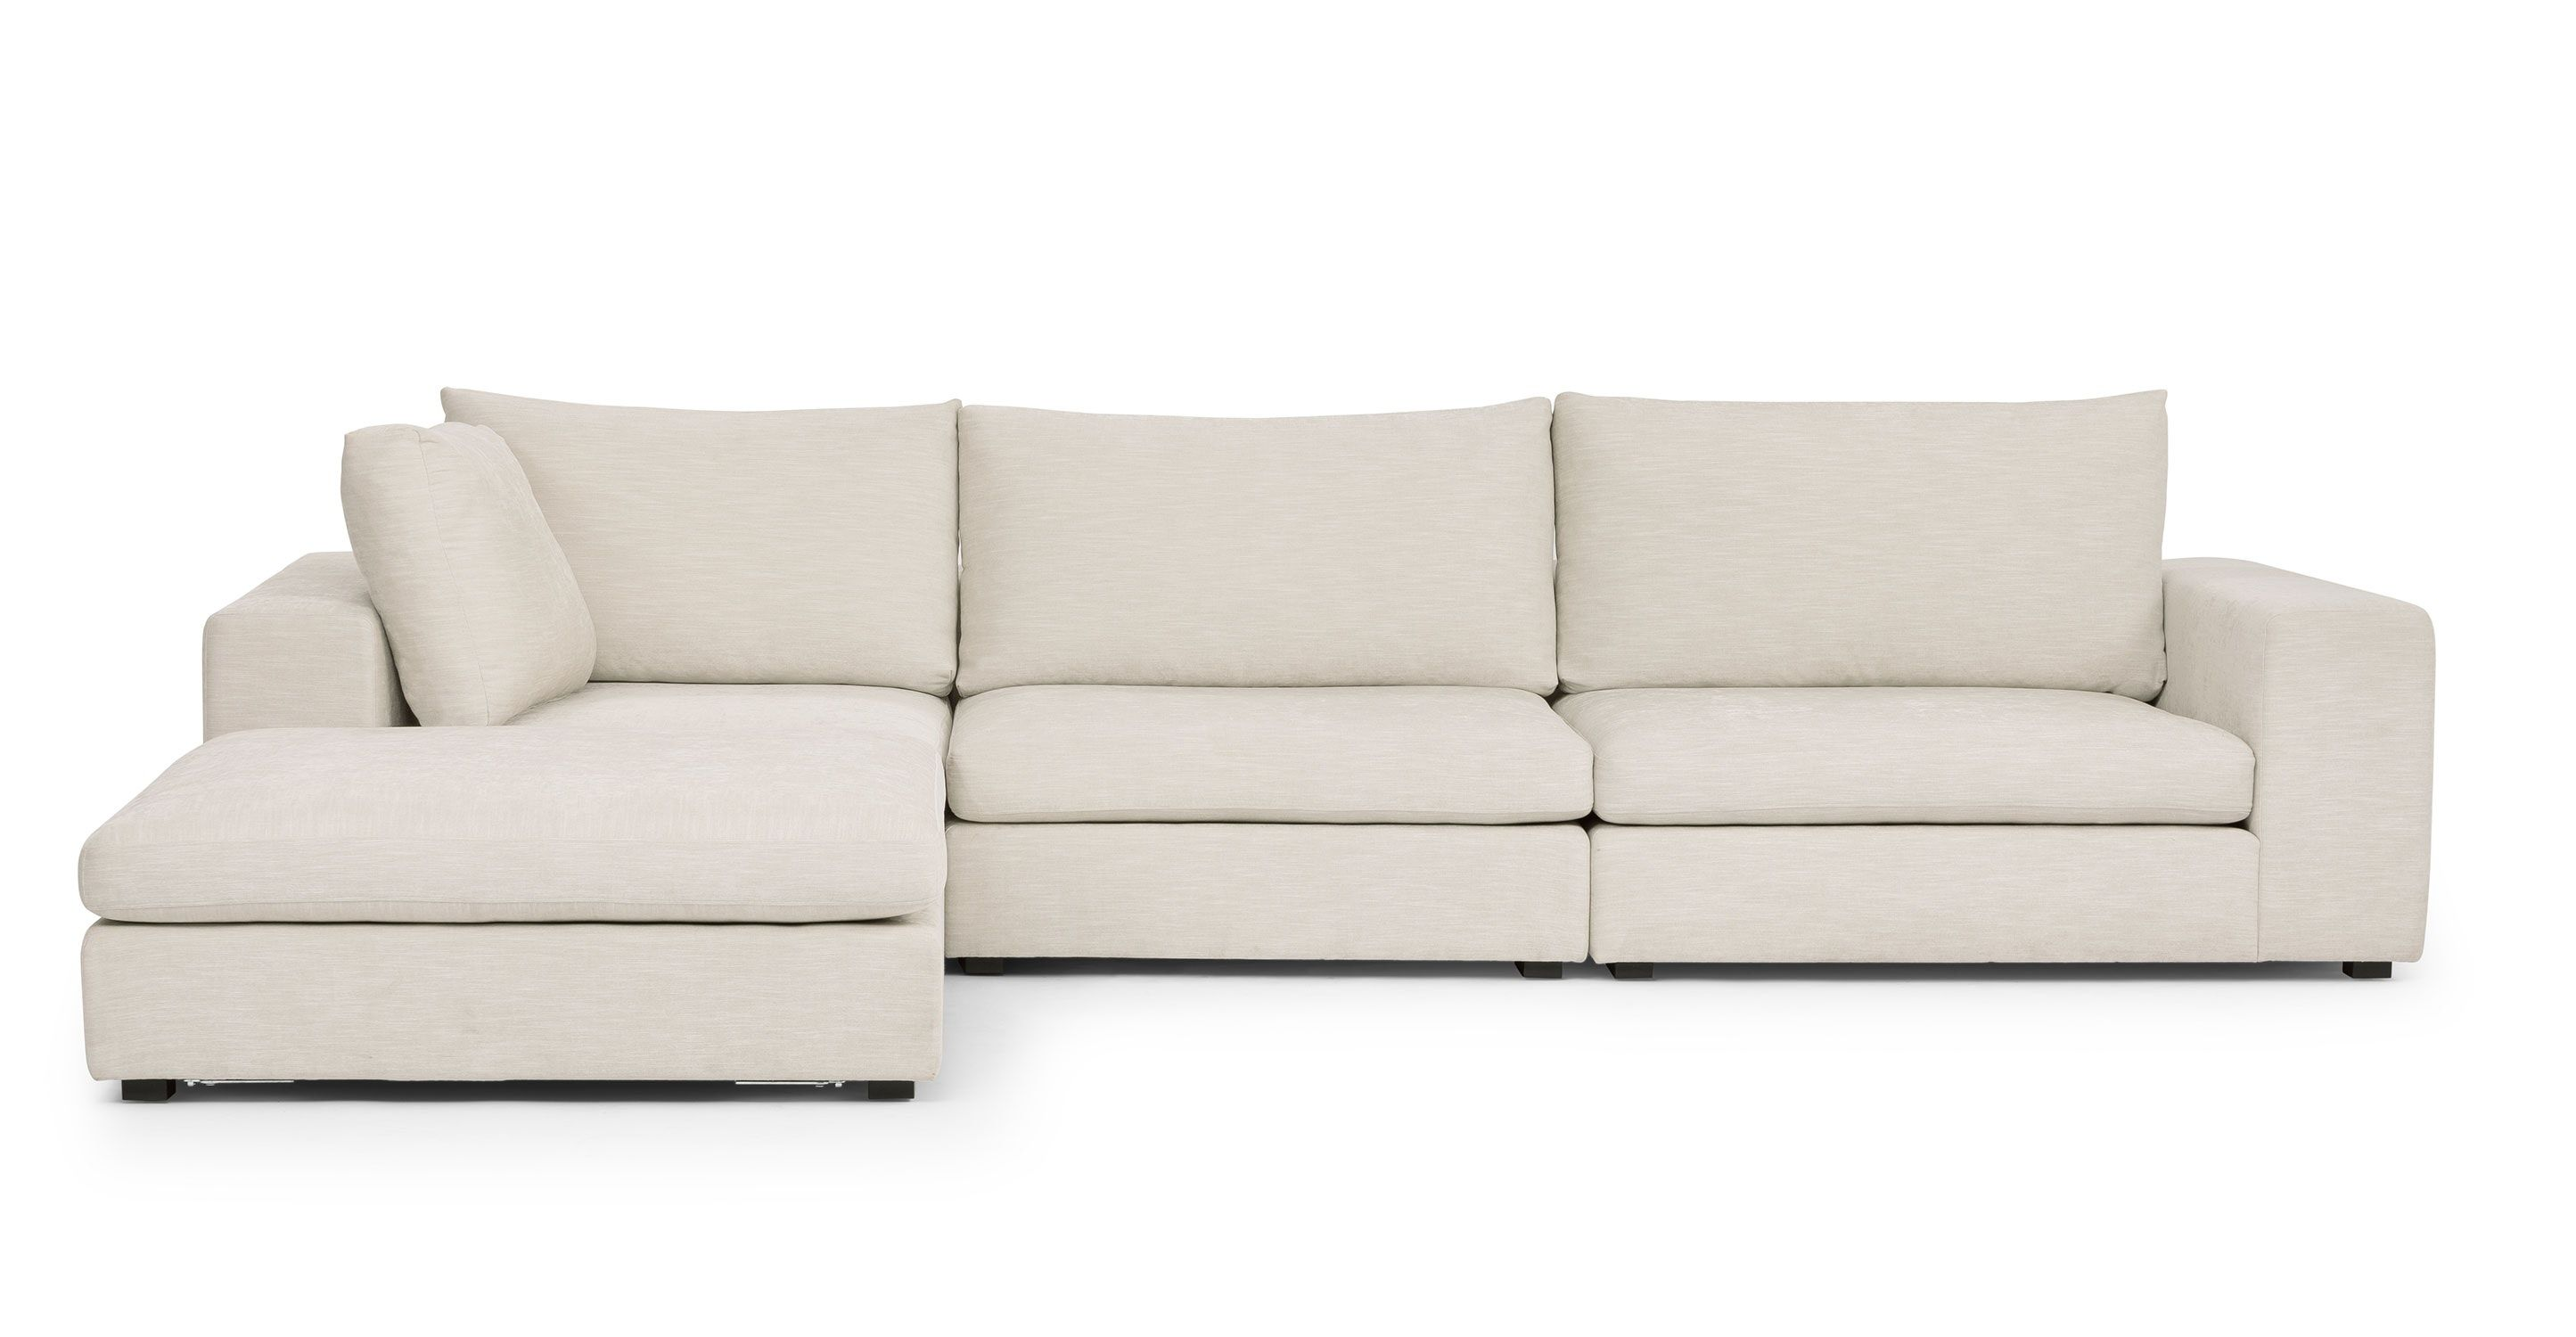 Gaba Pearl White Left Modular Sectional Modular Sofa Modern